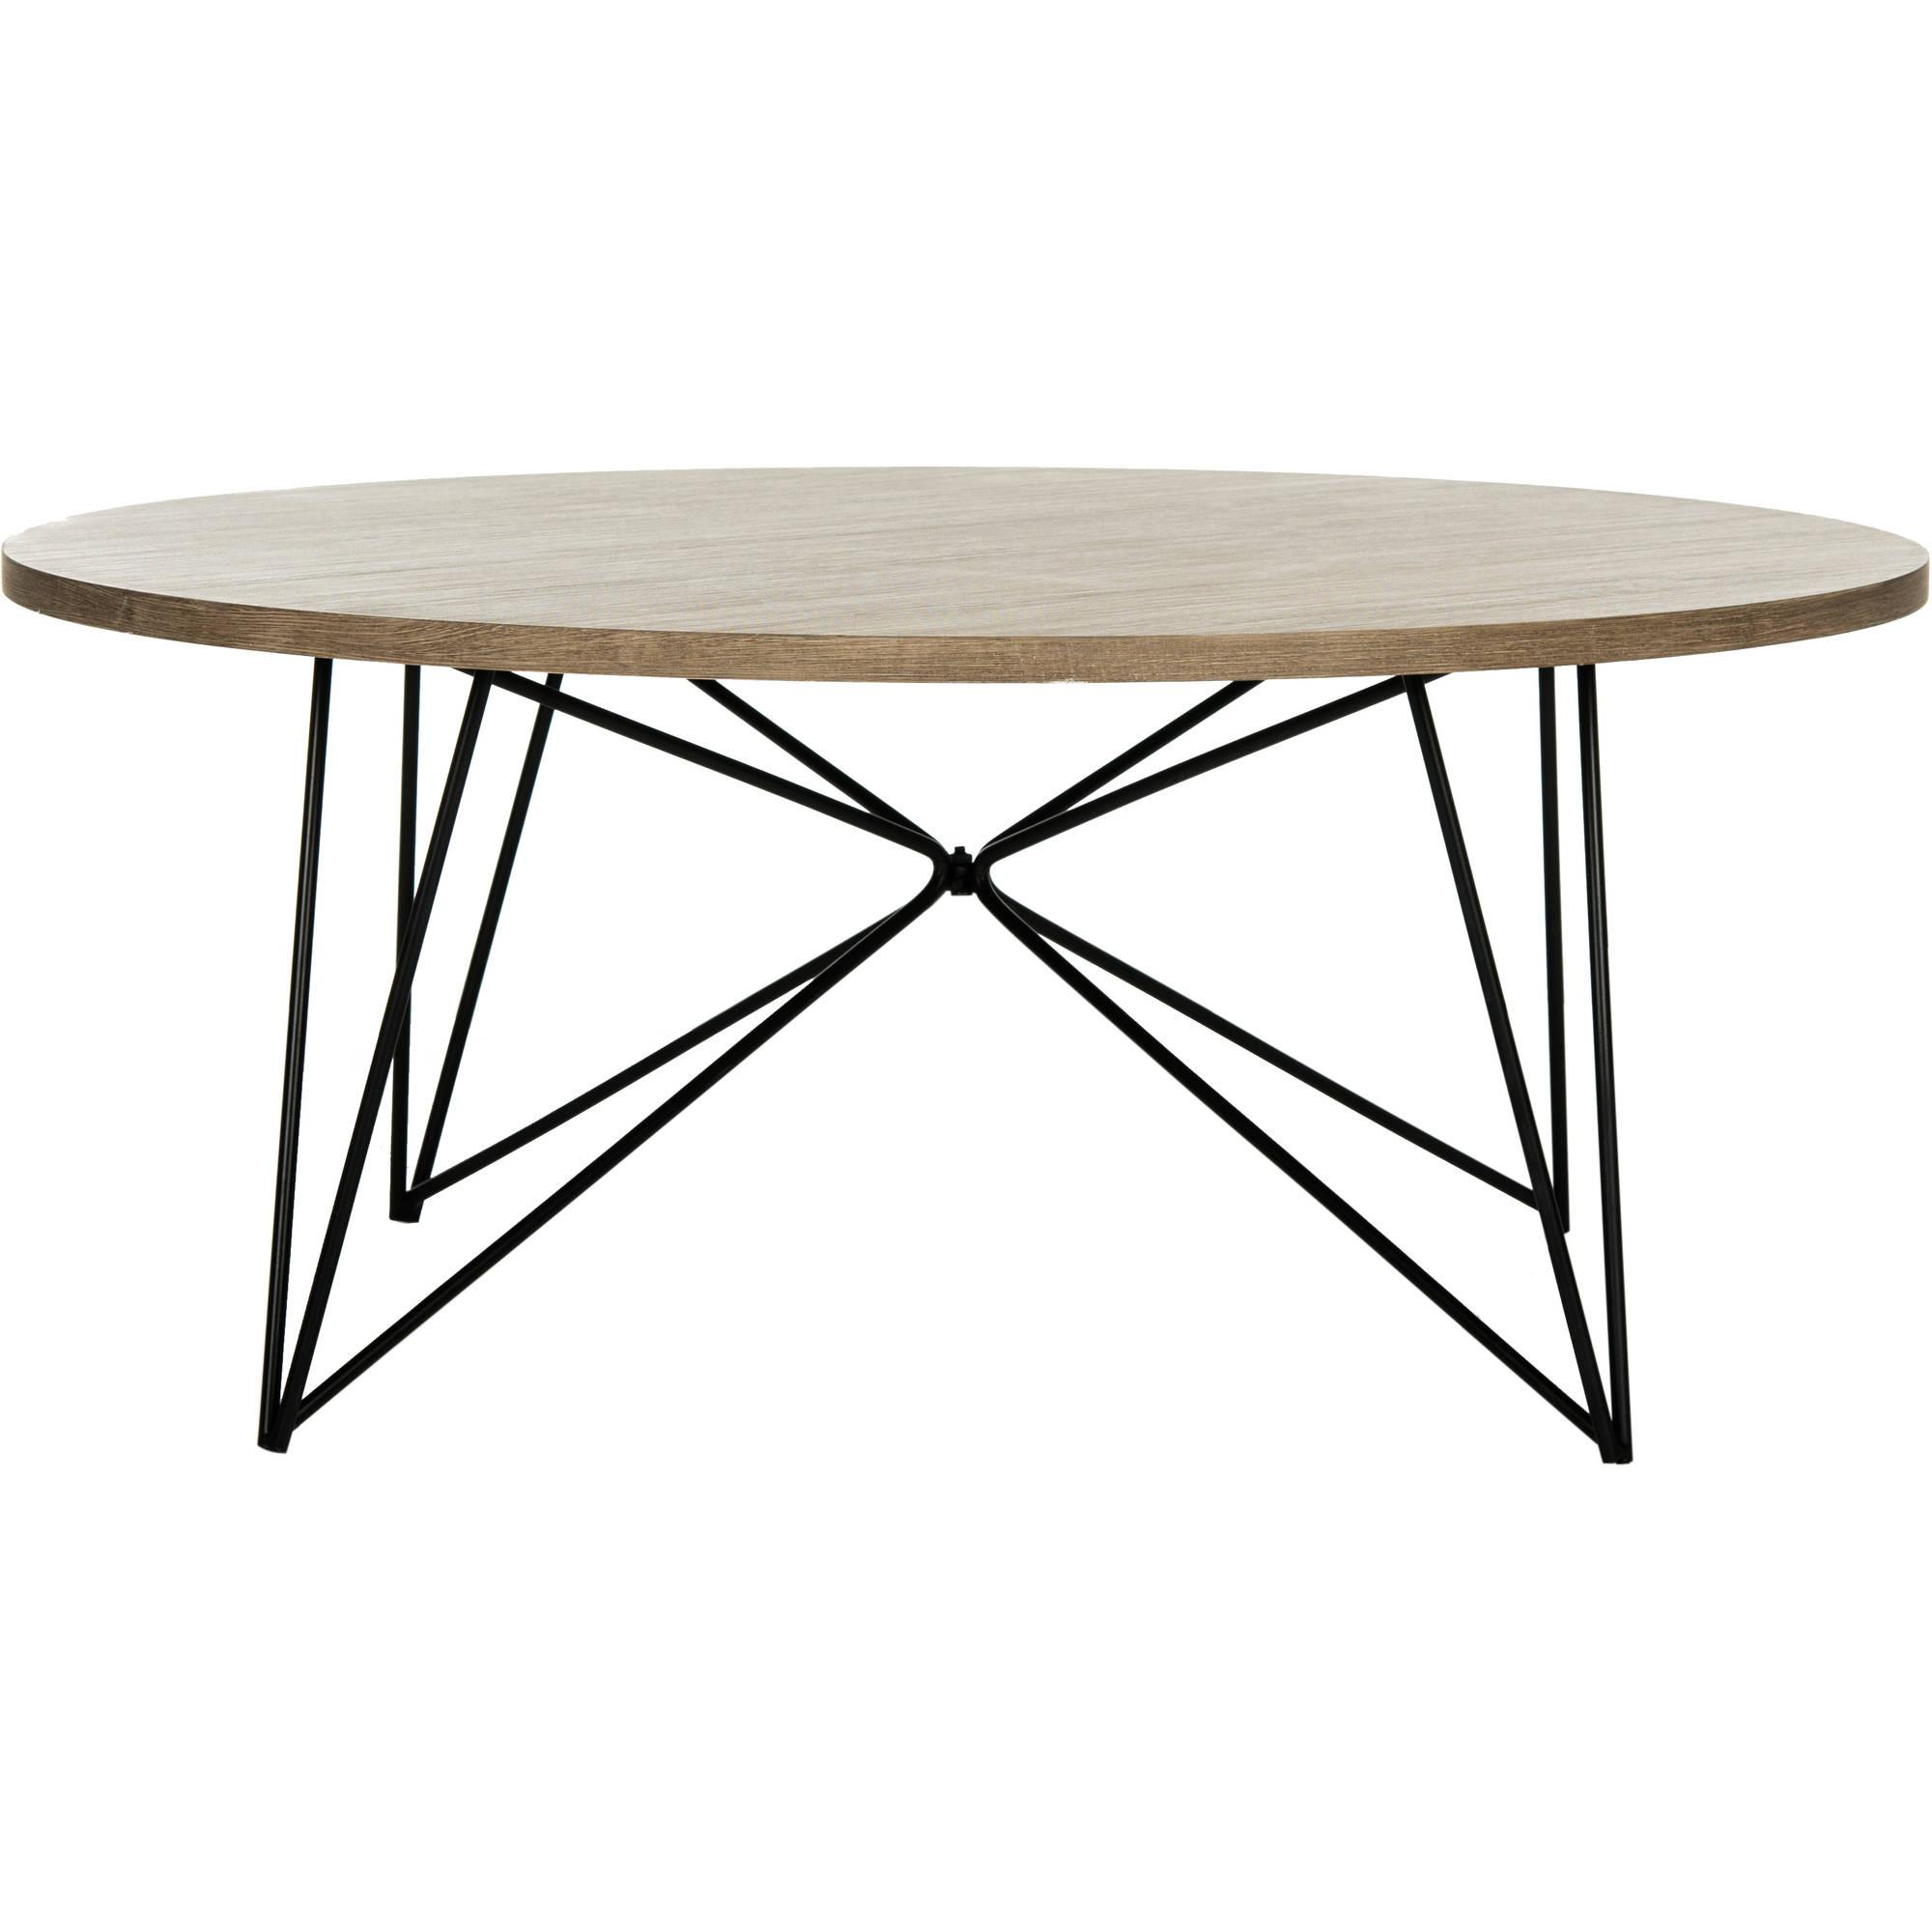 Transitional coffee table - Safavieh Maris 33 5 Round Retro Mid Century Coffee Table Multiple Colors Walmart Com